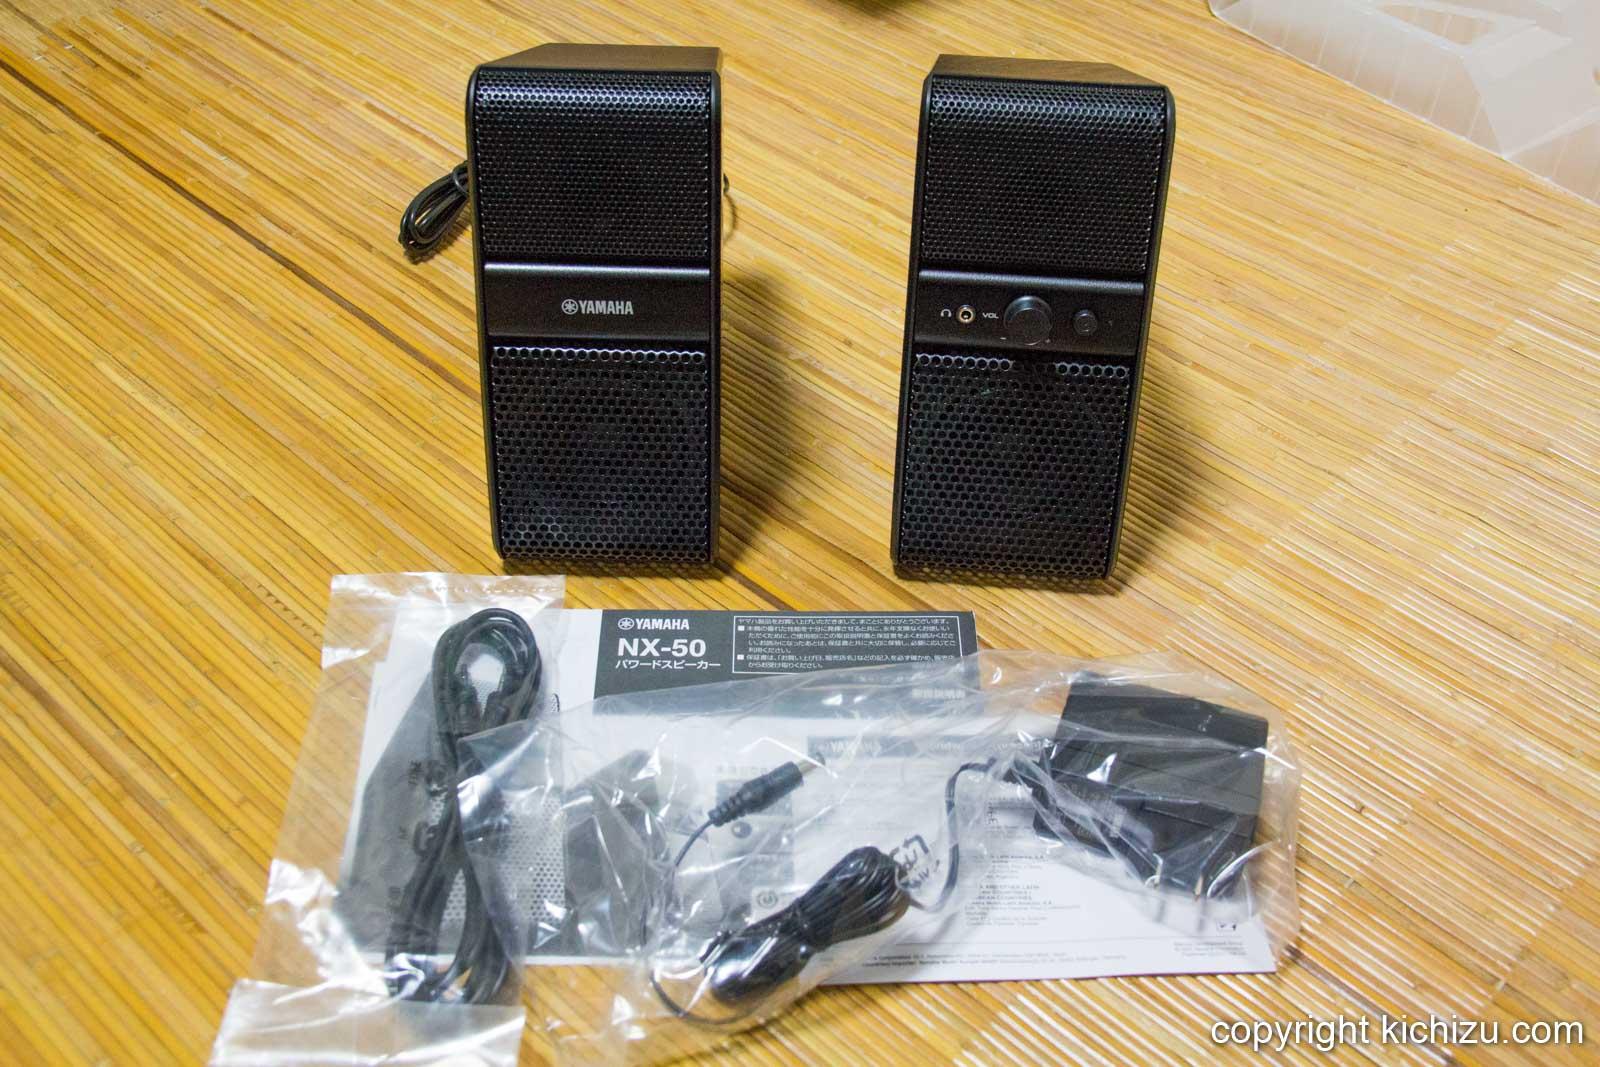 NX-50本体と付属品